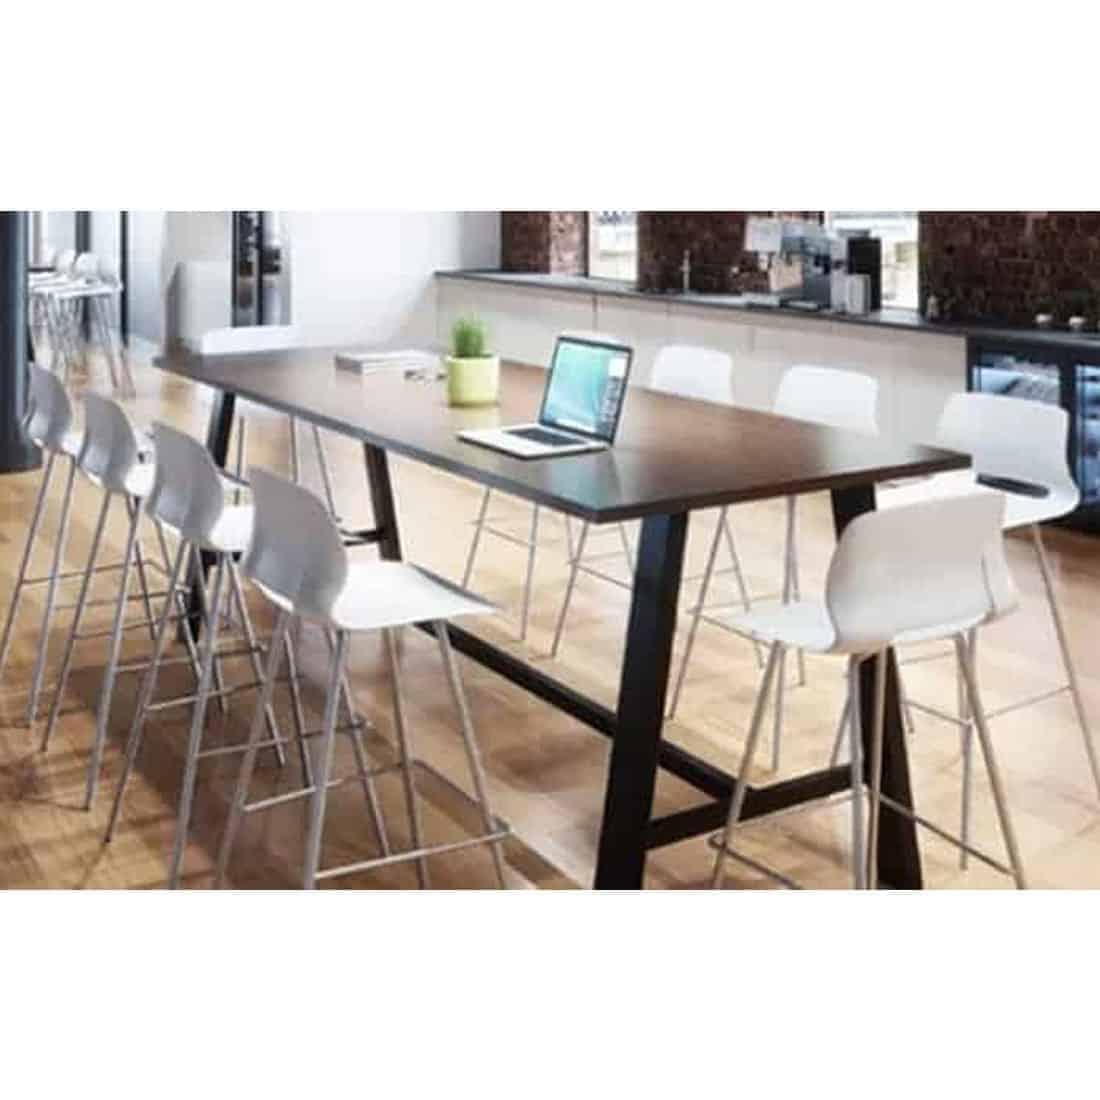 KFI bar height table